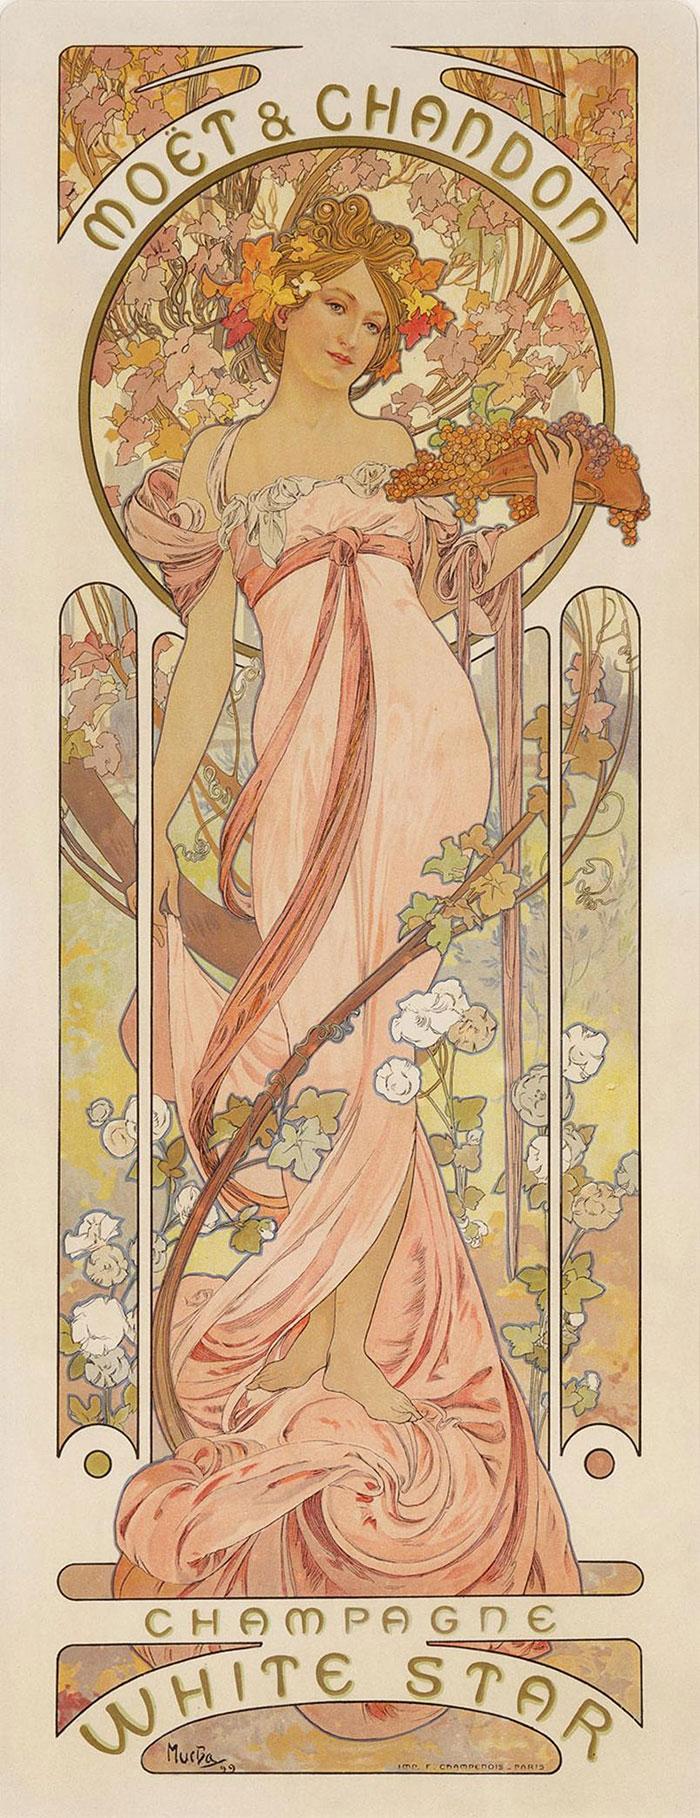 """If it looks like a Cottagecore pin-up girl, then its Art Nouveau"""